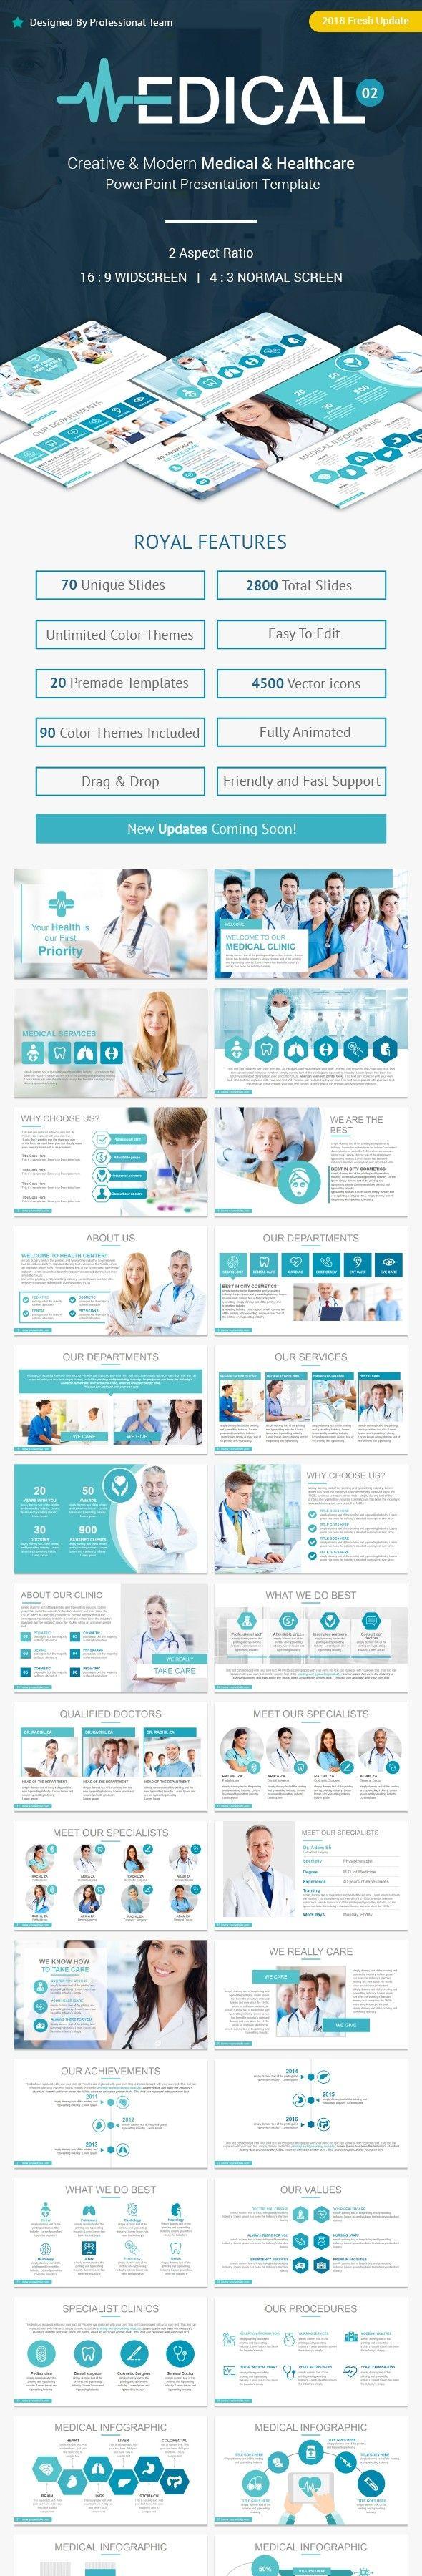 best medical powerpoint presentation templates, brain